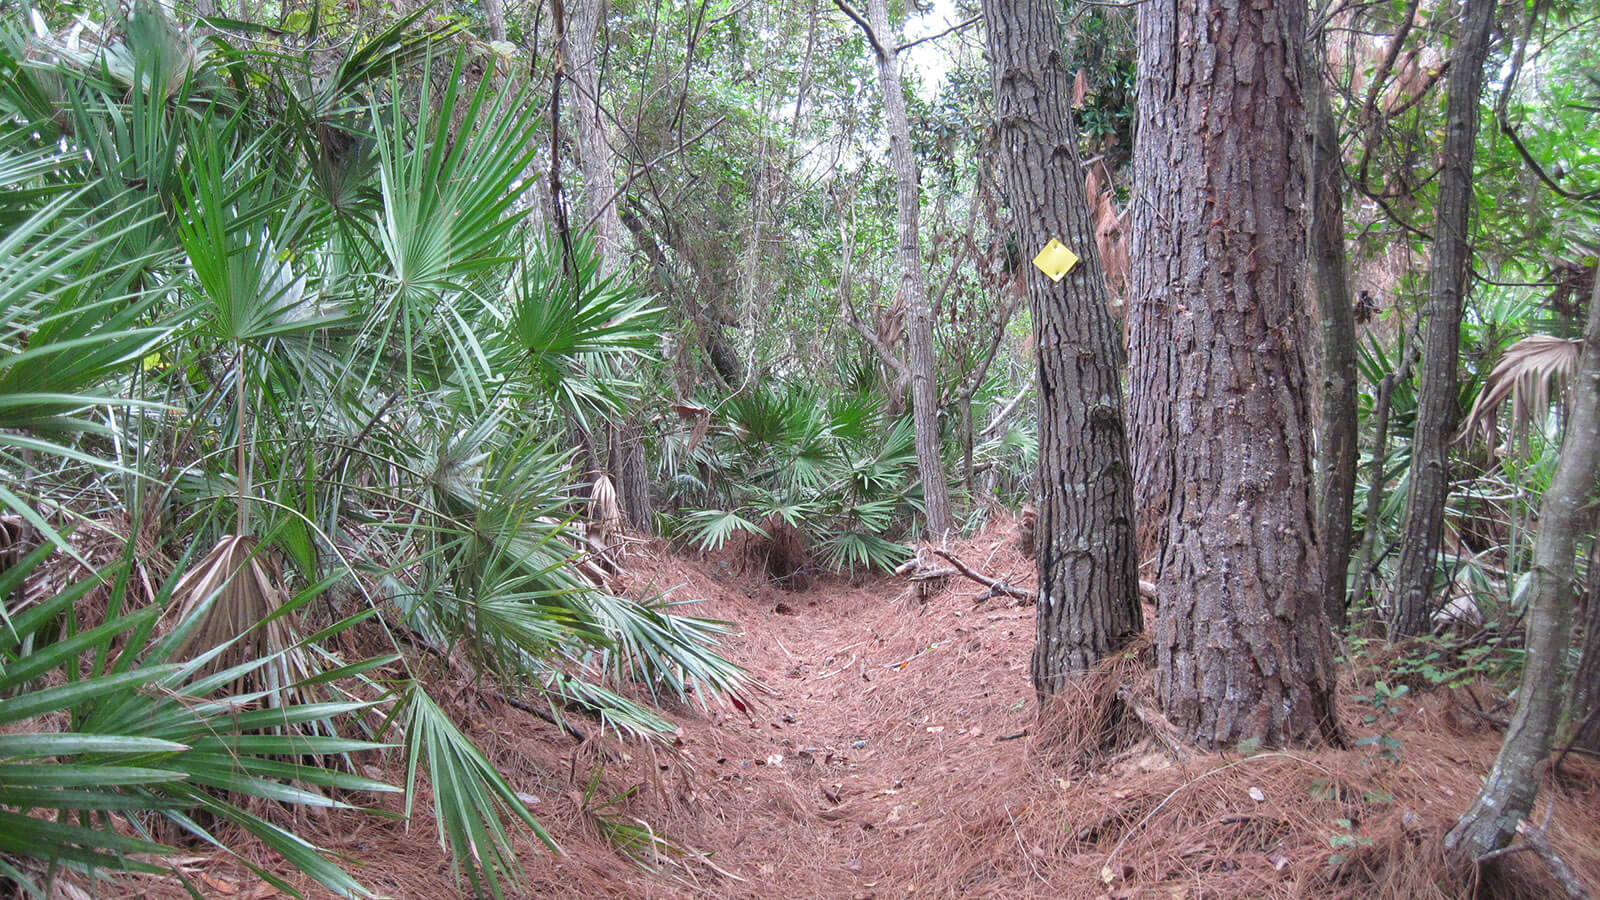 Footpath under pines